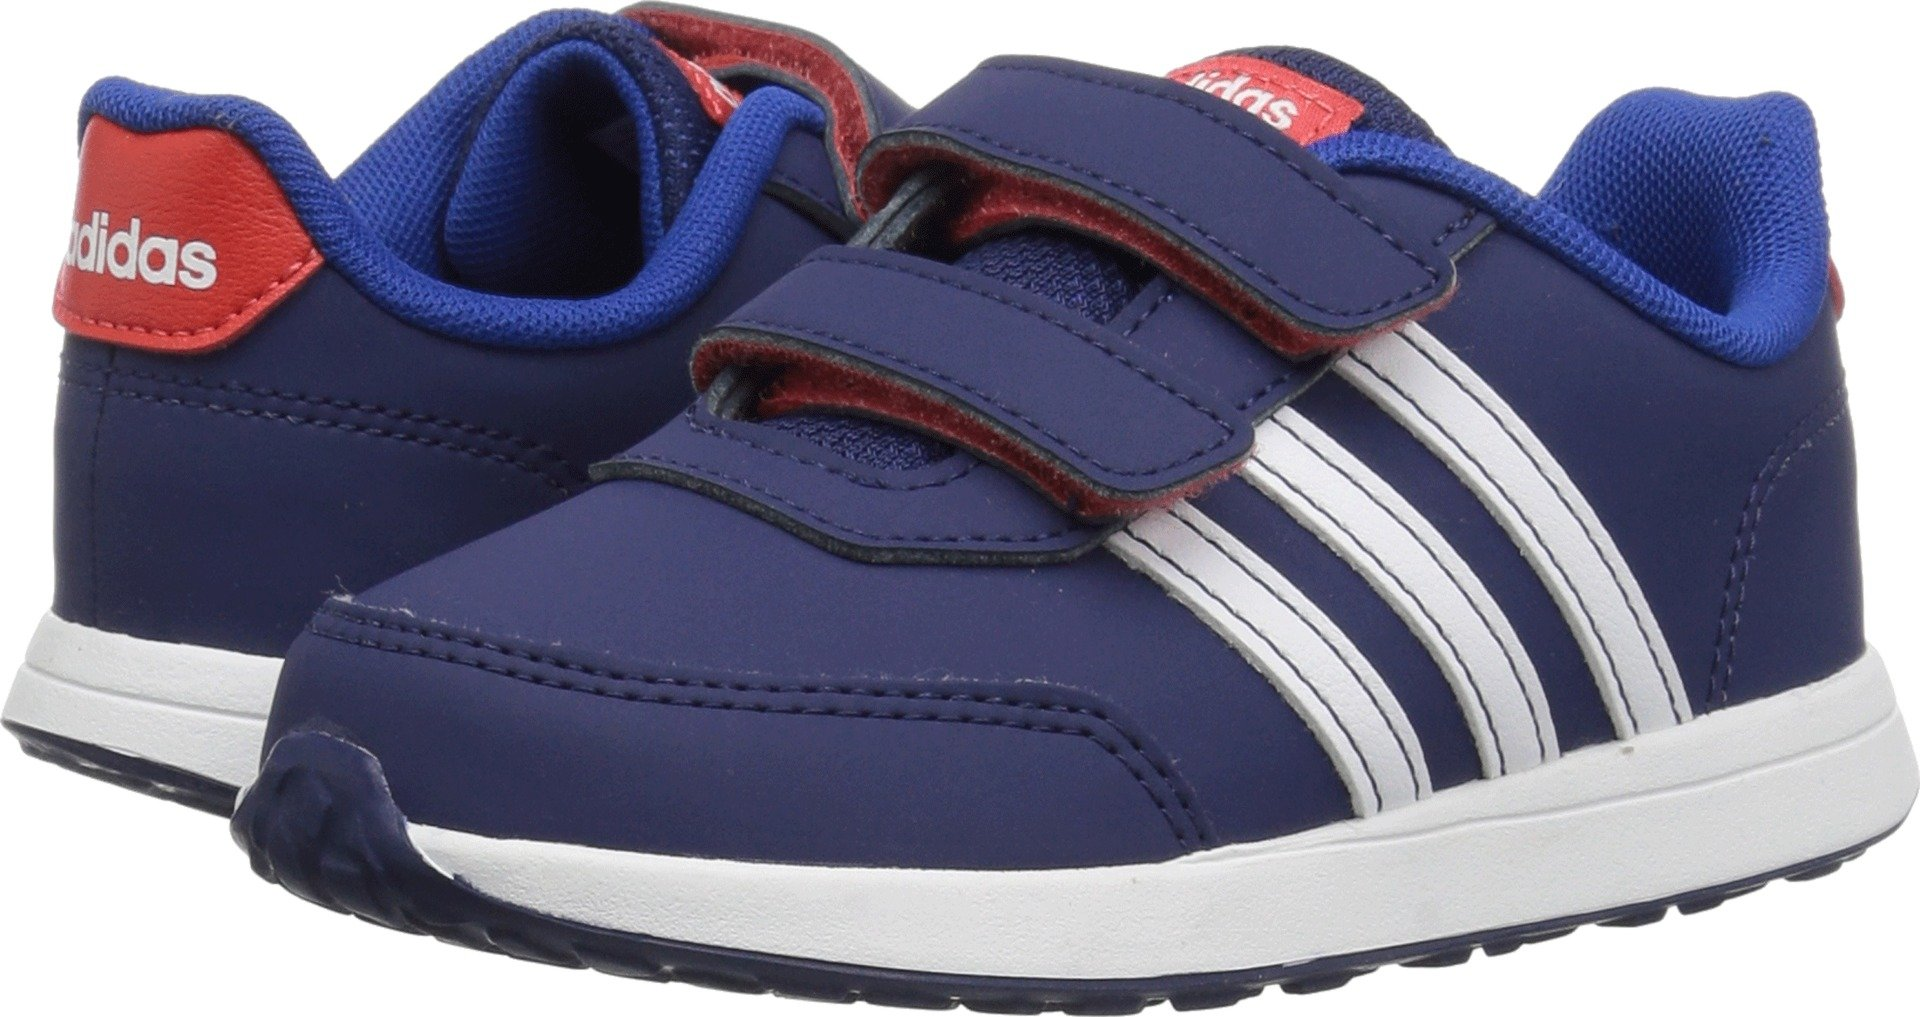 adidas Kids' VS Switch 2 Sneaker, Dark Blue/White/Hi-Res Red, 6K M US Toddler